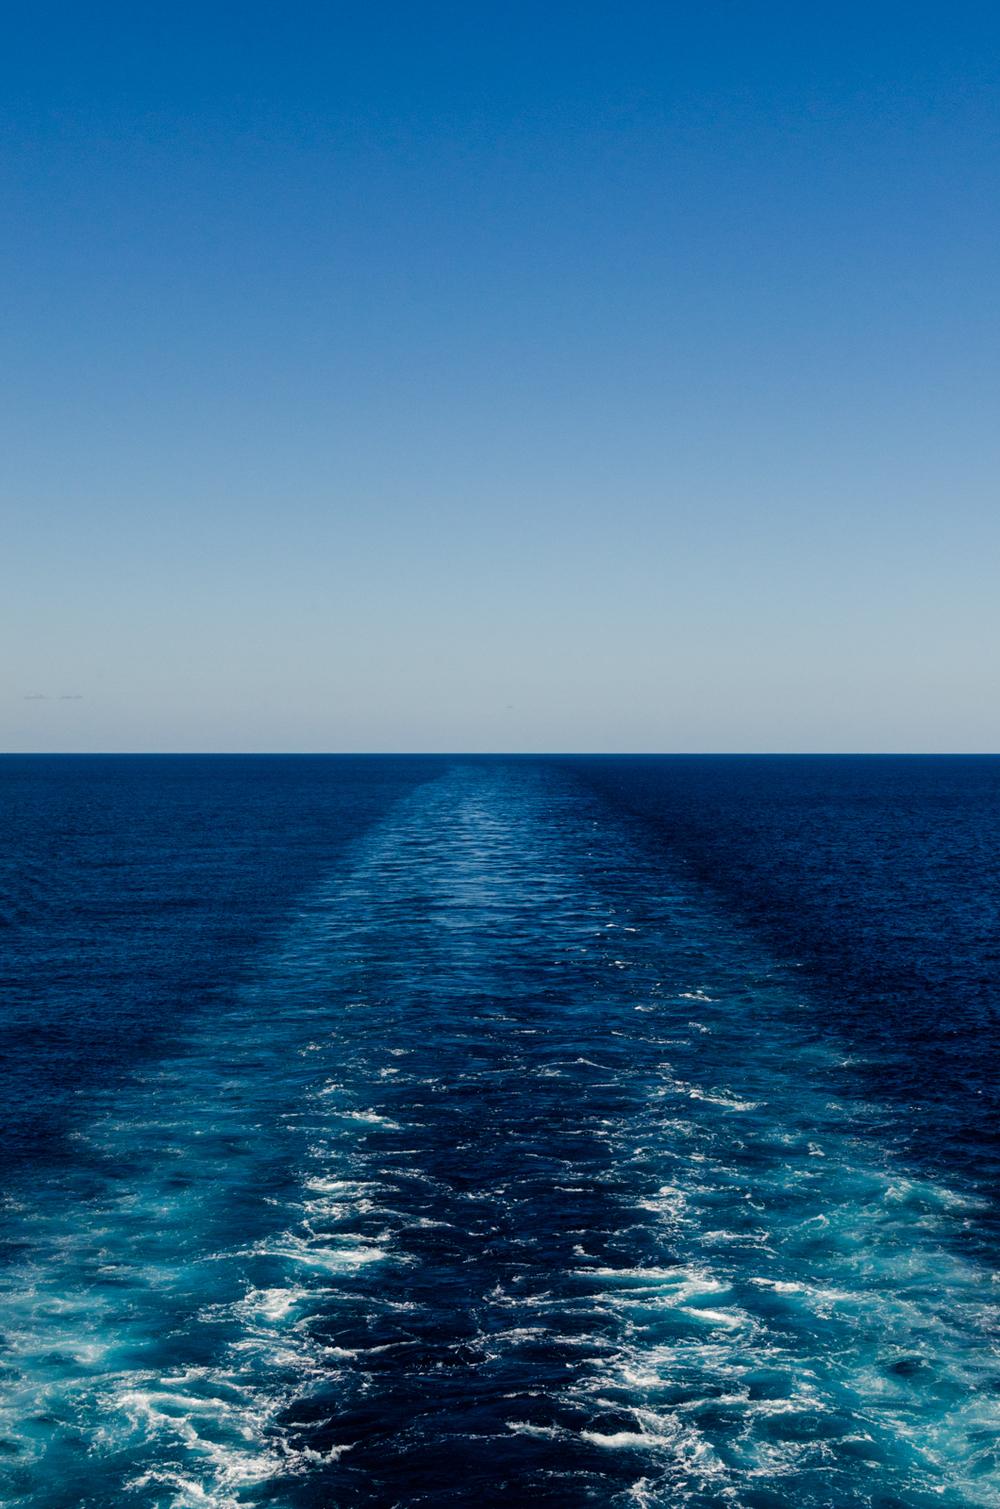 Project 365: #49 - Cruising